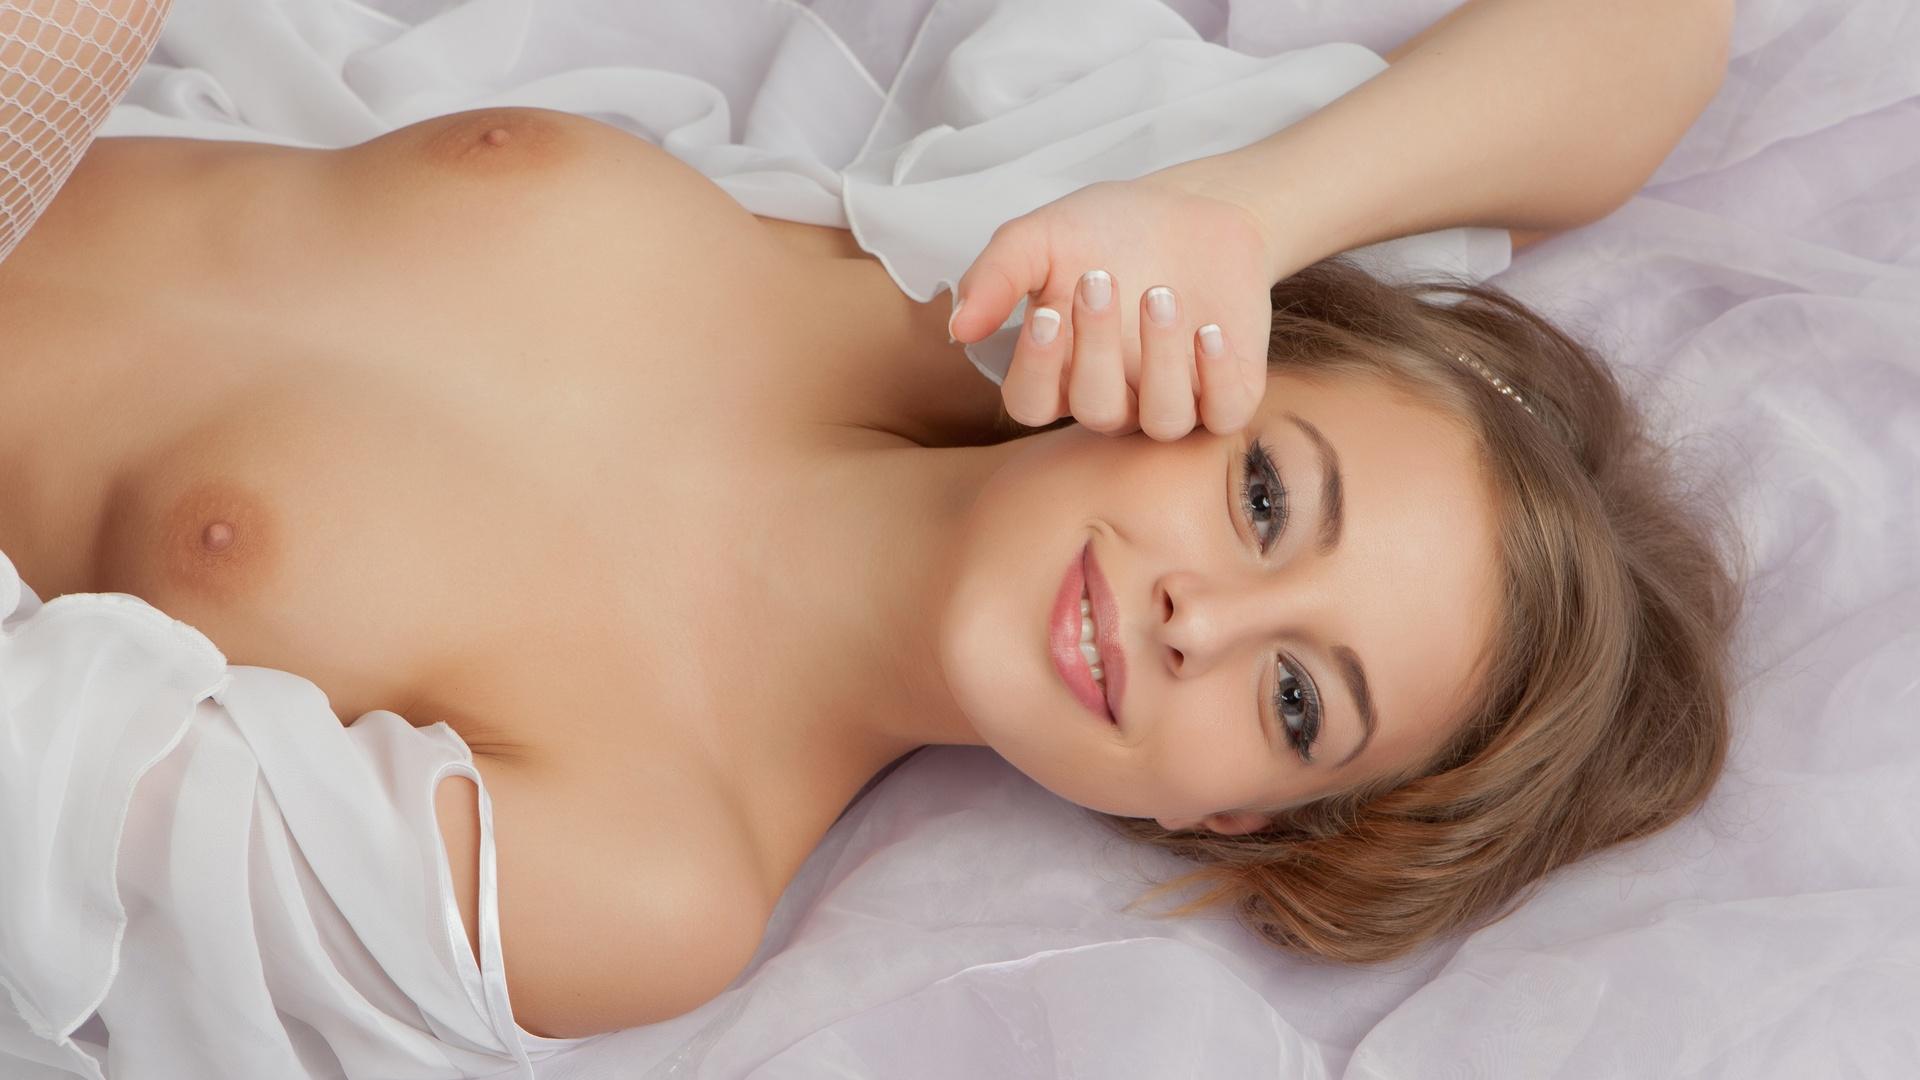 Smiling nude women 1